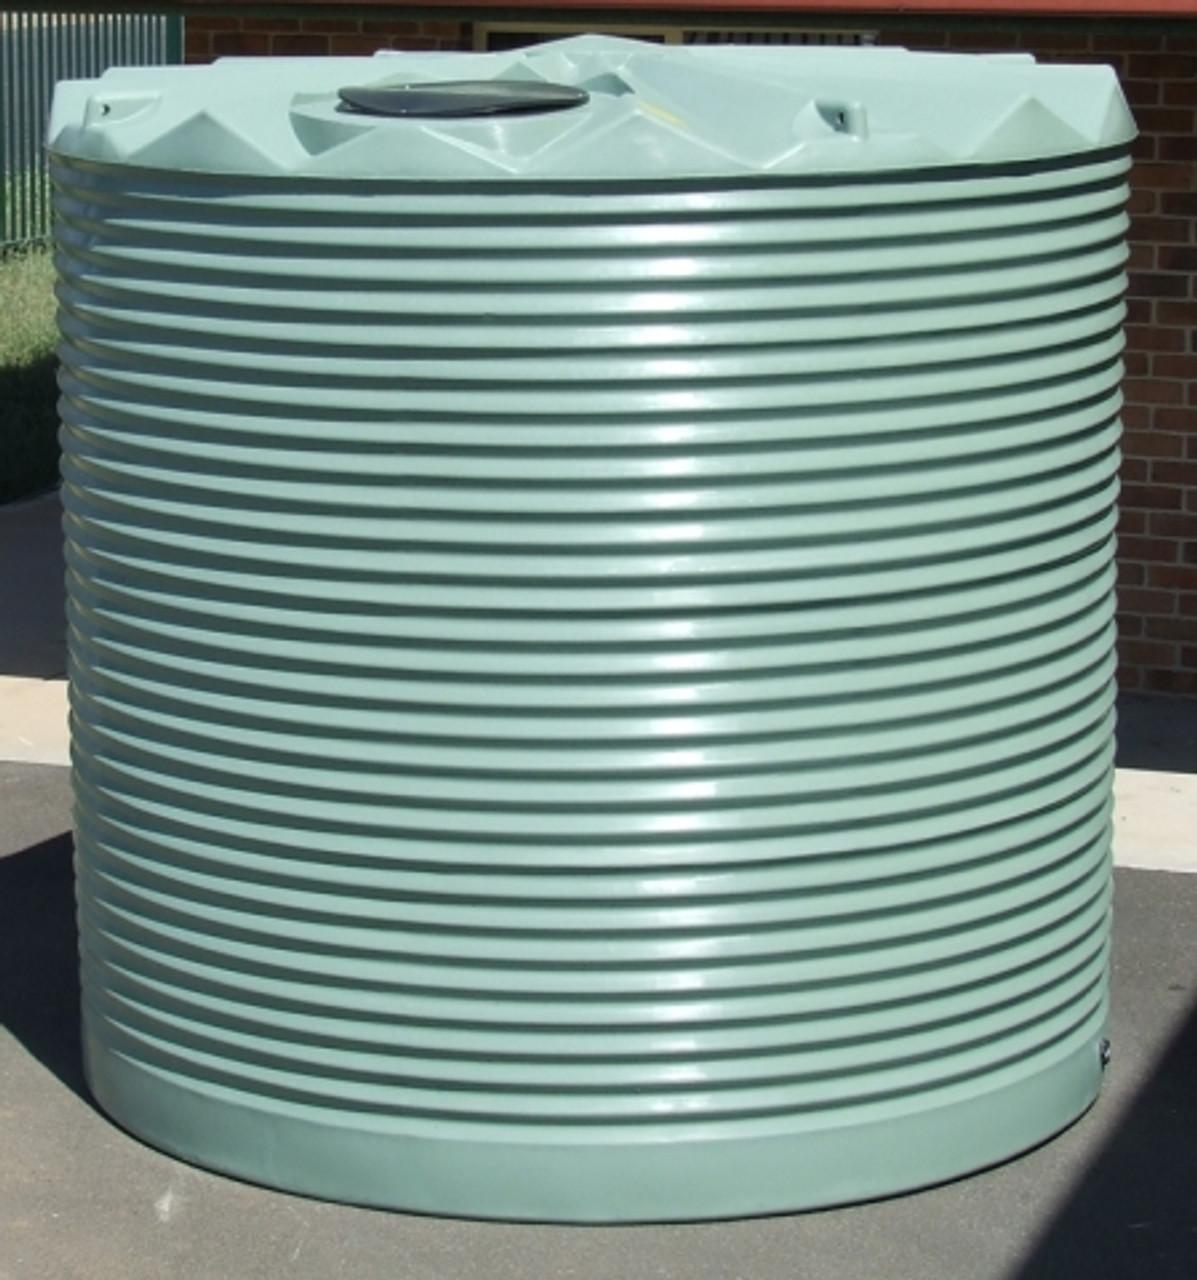 7,000 Litre Round Poly Tank - Corrugated Profile